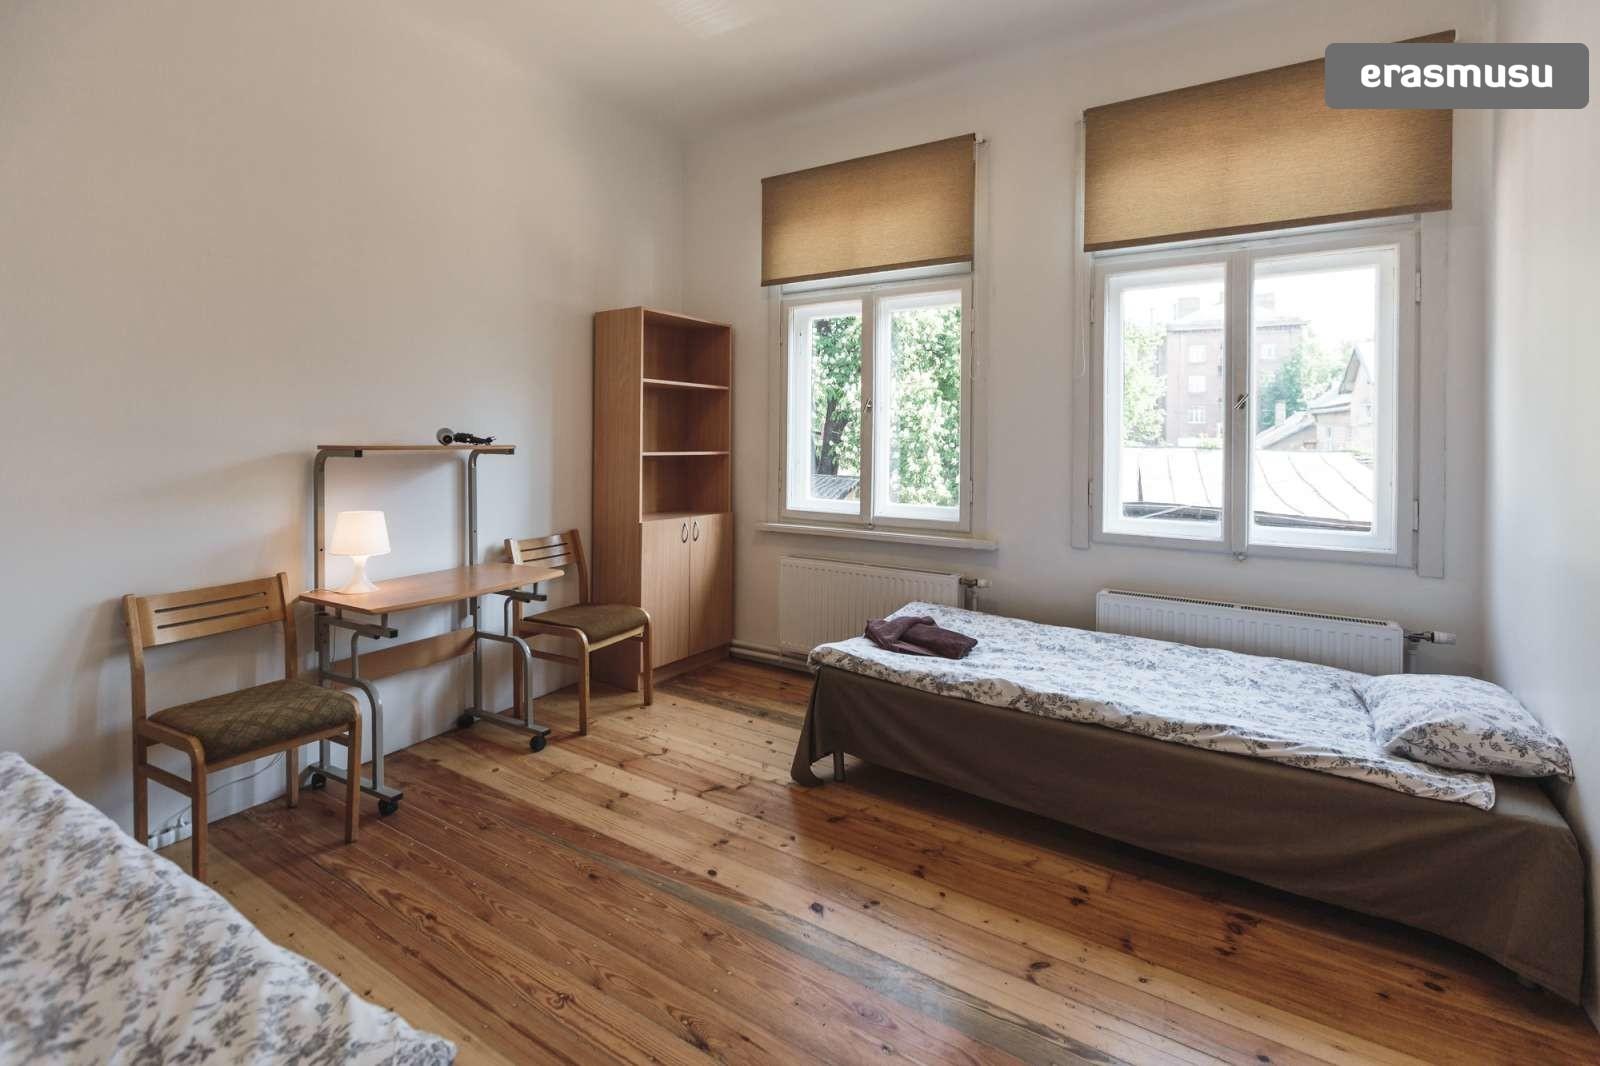 stylish-studio-apartment-rent-agenskalns-pet-friendly-ce39ee8e5b